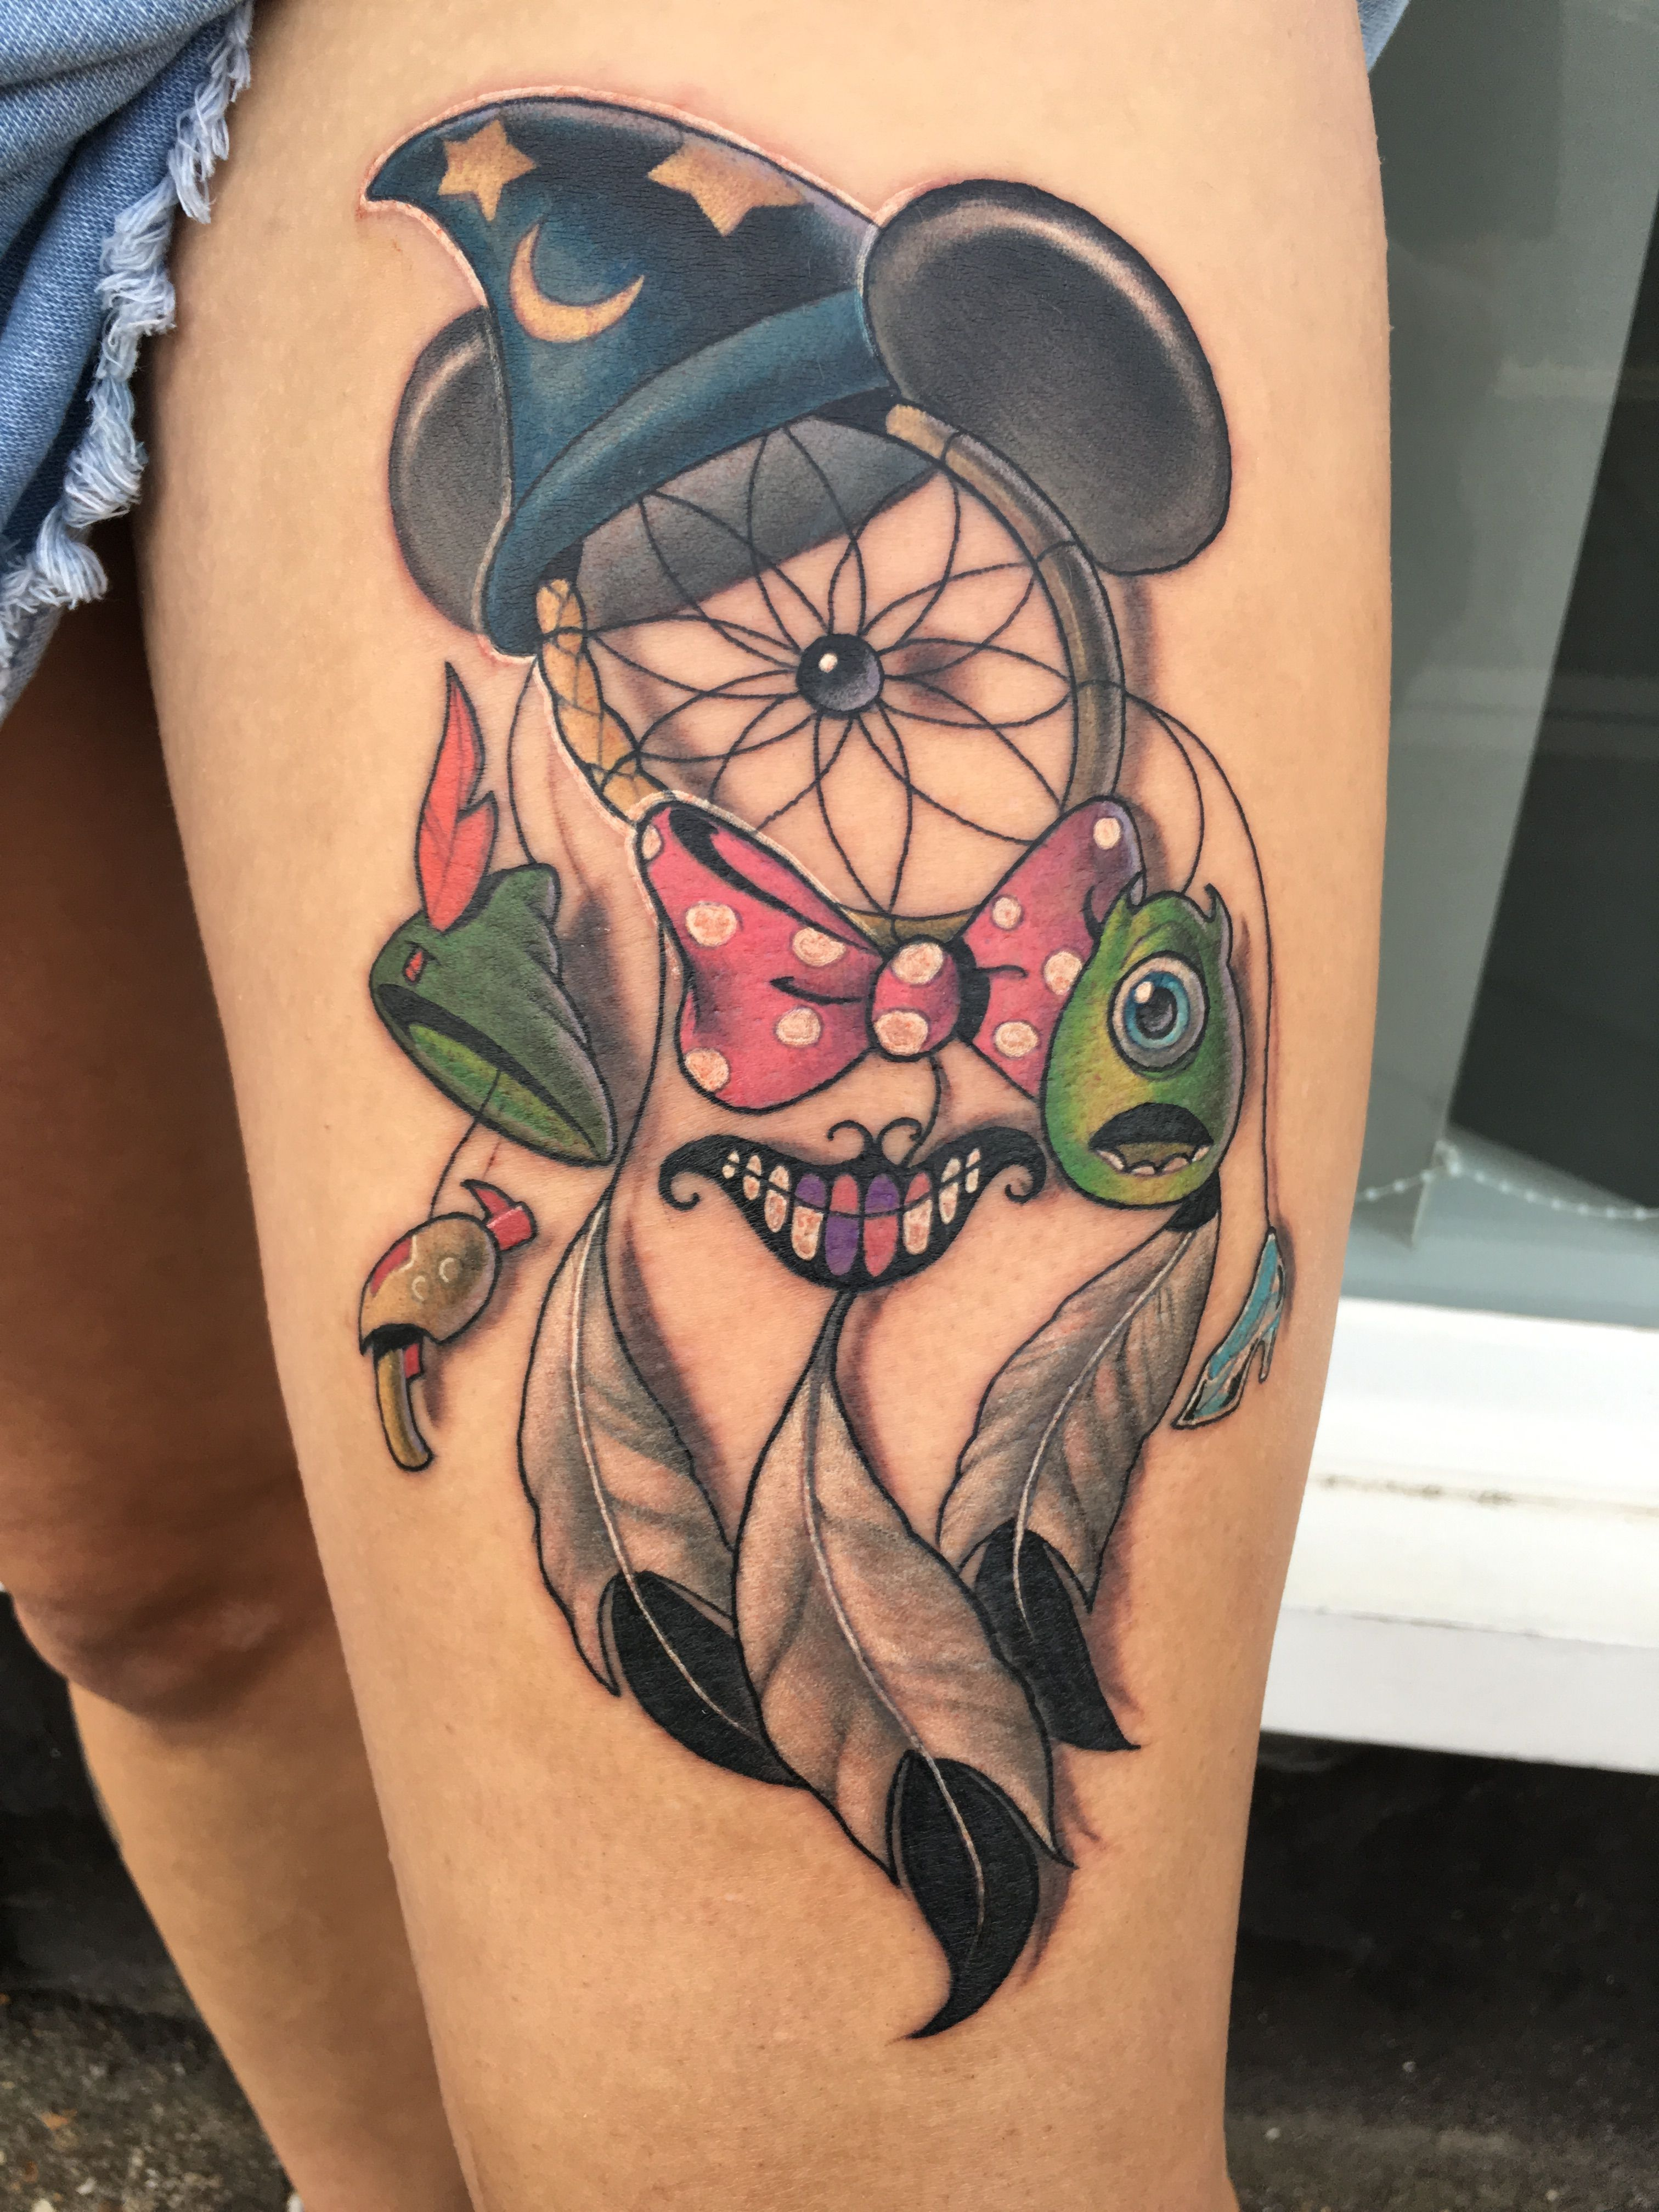 Disney Dream Catcher Tattoo : disney, dream, catcher, tattoo, Disney, Dreamcatcher, Tattoo, Mouse, Tattoos,, Sleeve, Tattoos